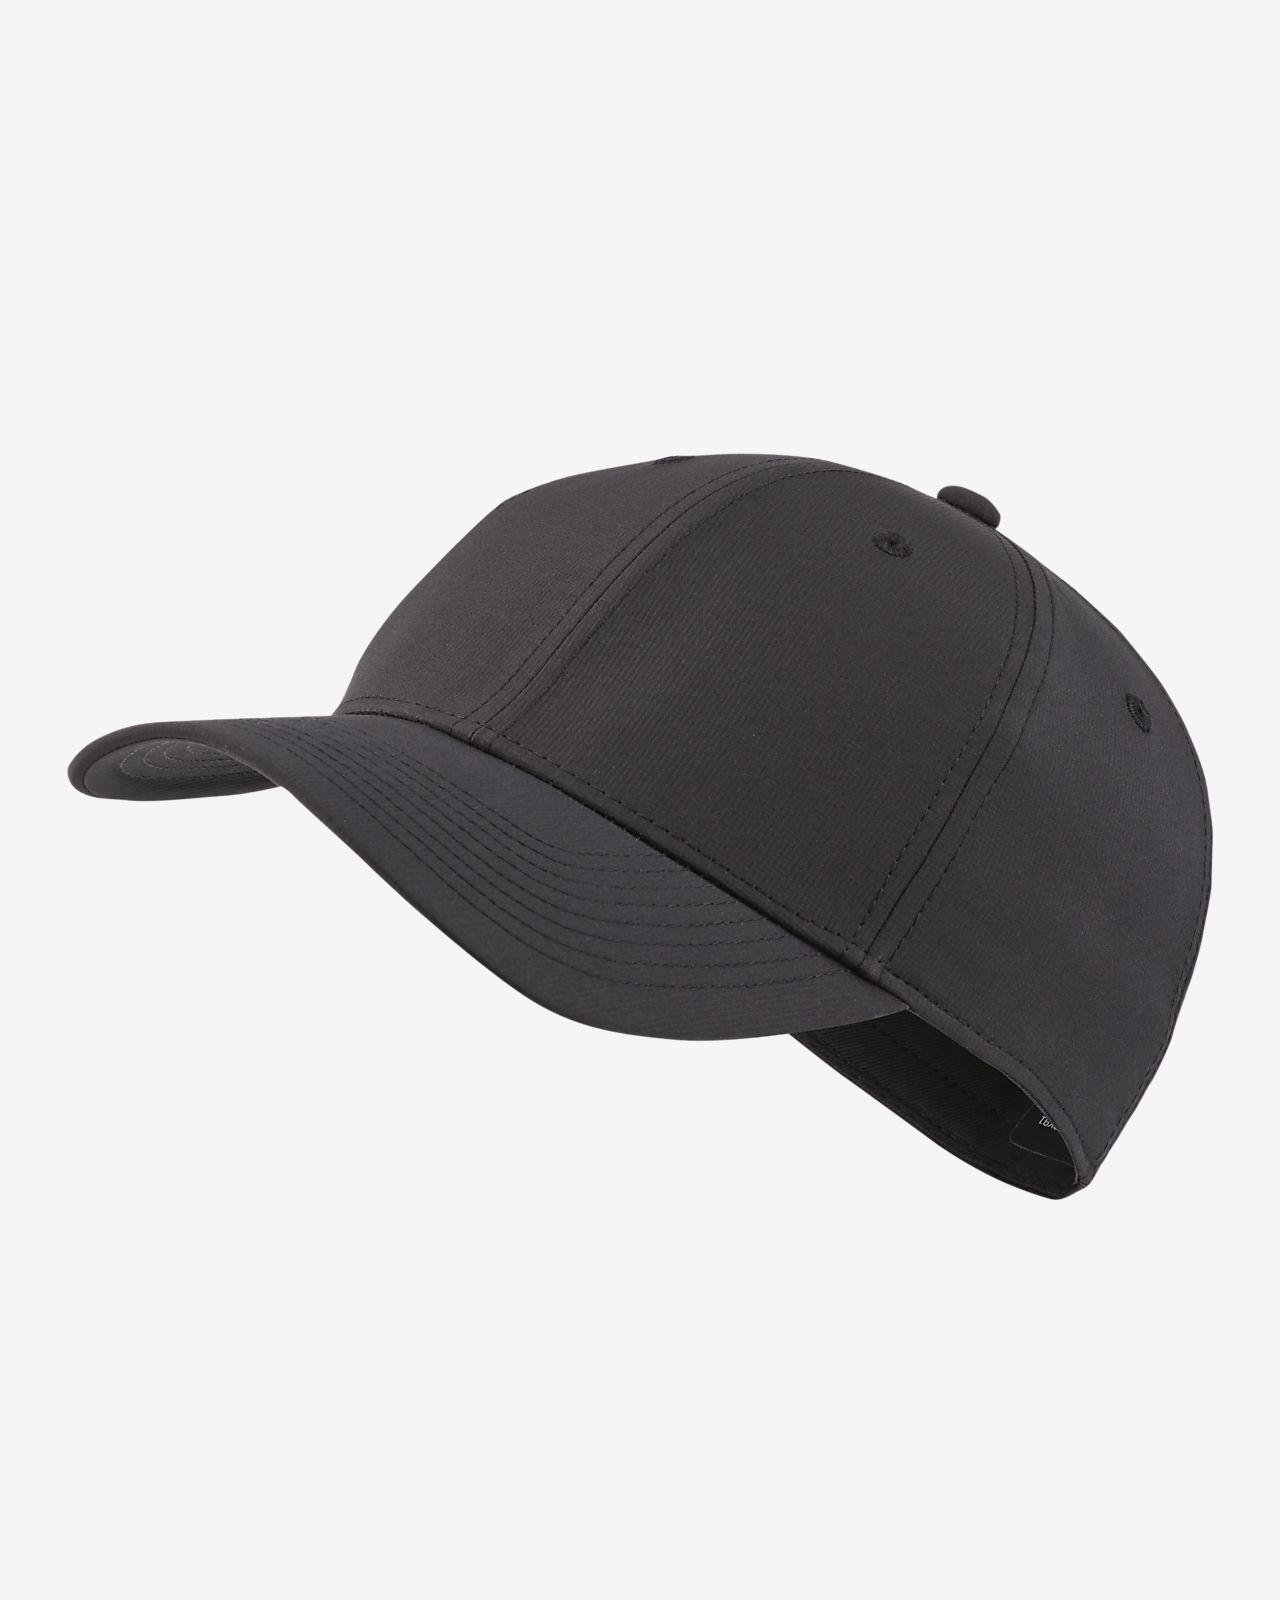 Nike Dri-FIT Legacy91 Golfcap